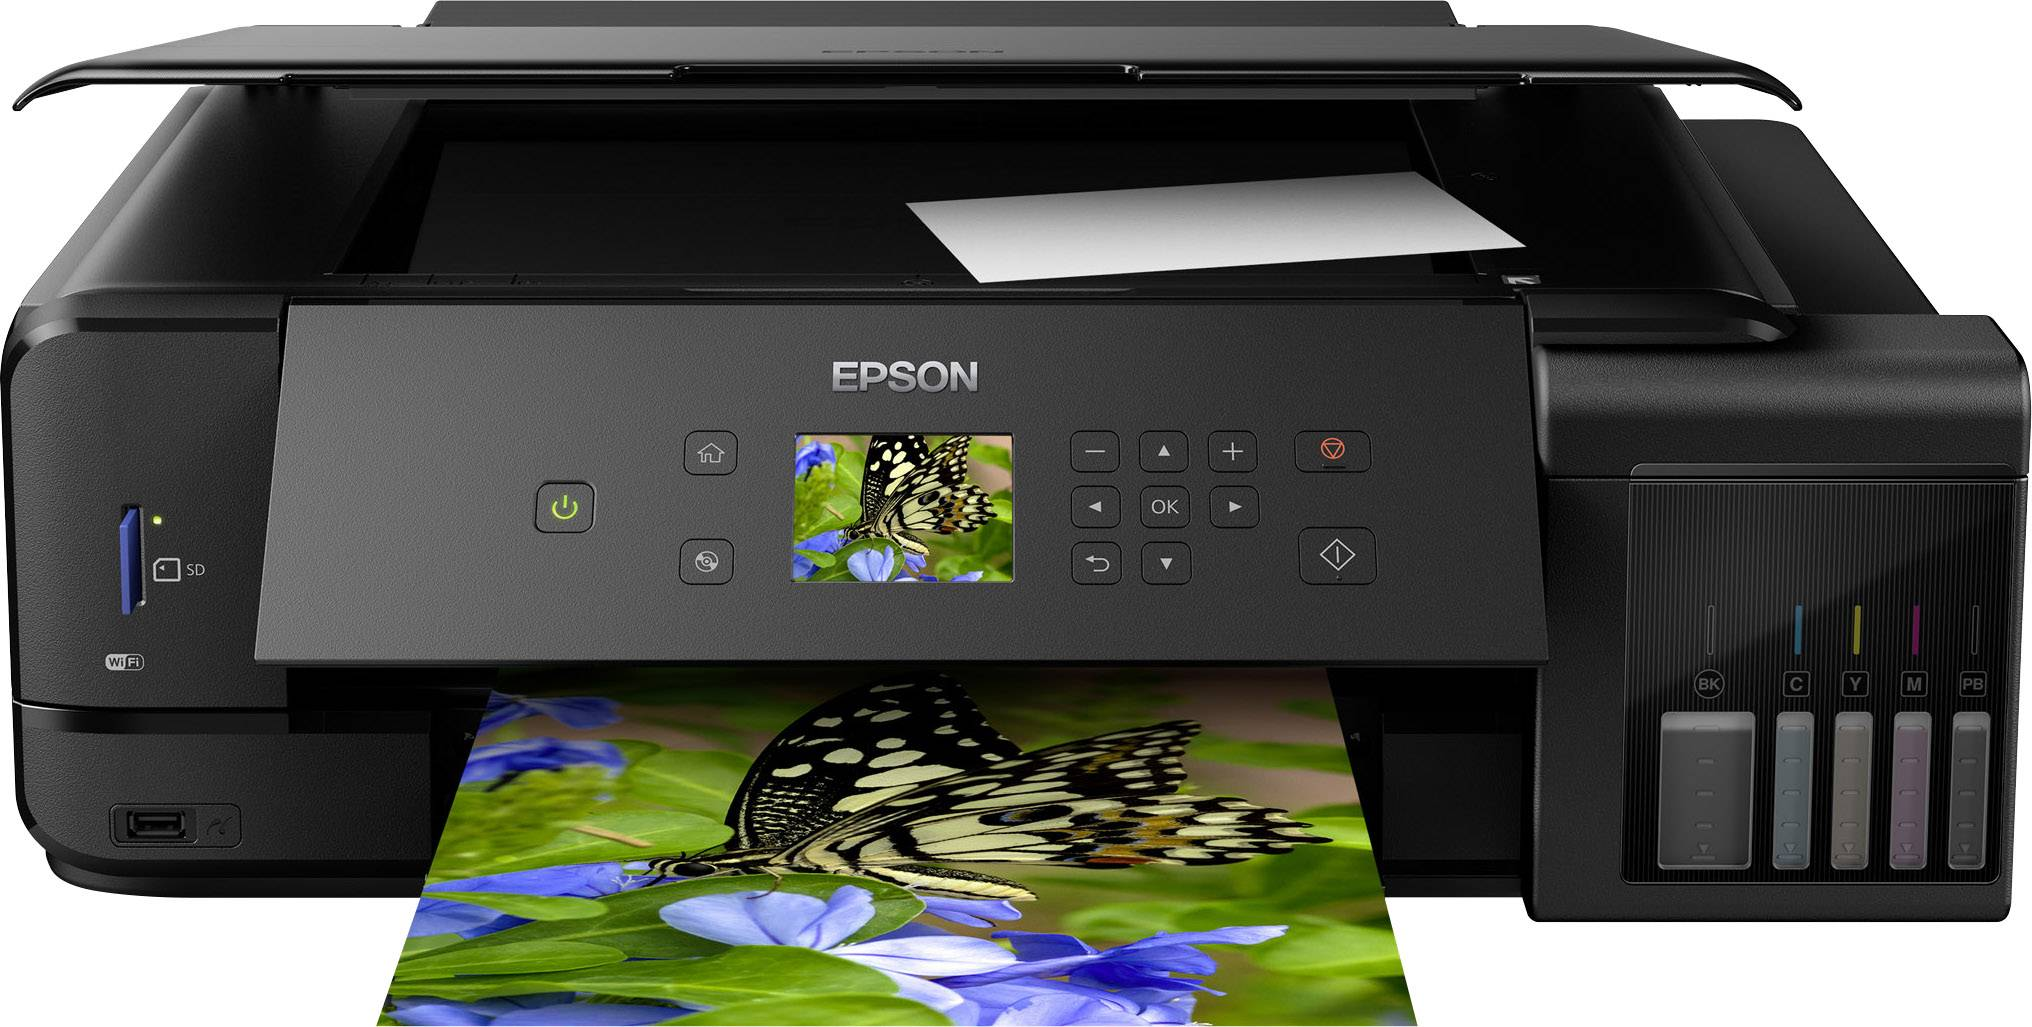 Epson EcoTank ET-7750 Inkjet multifunction printer A3 Printer